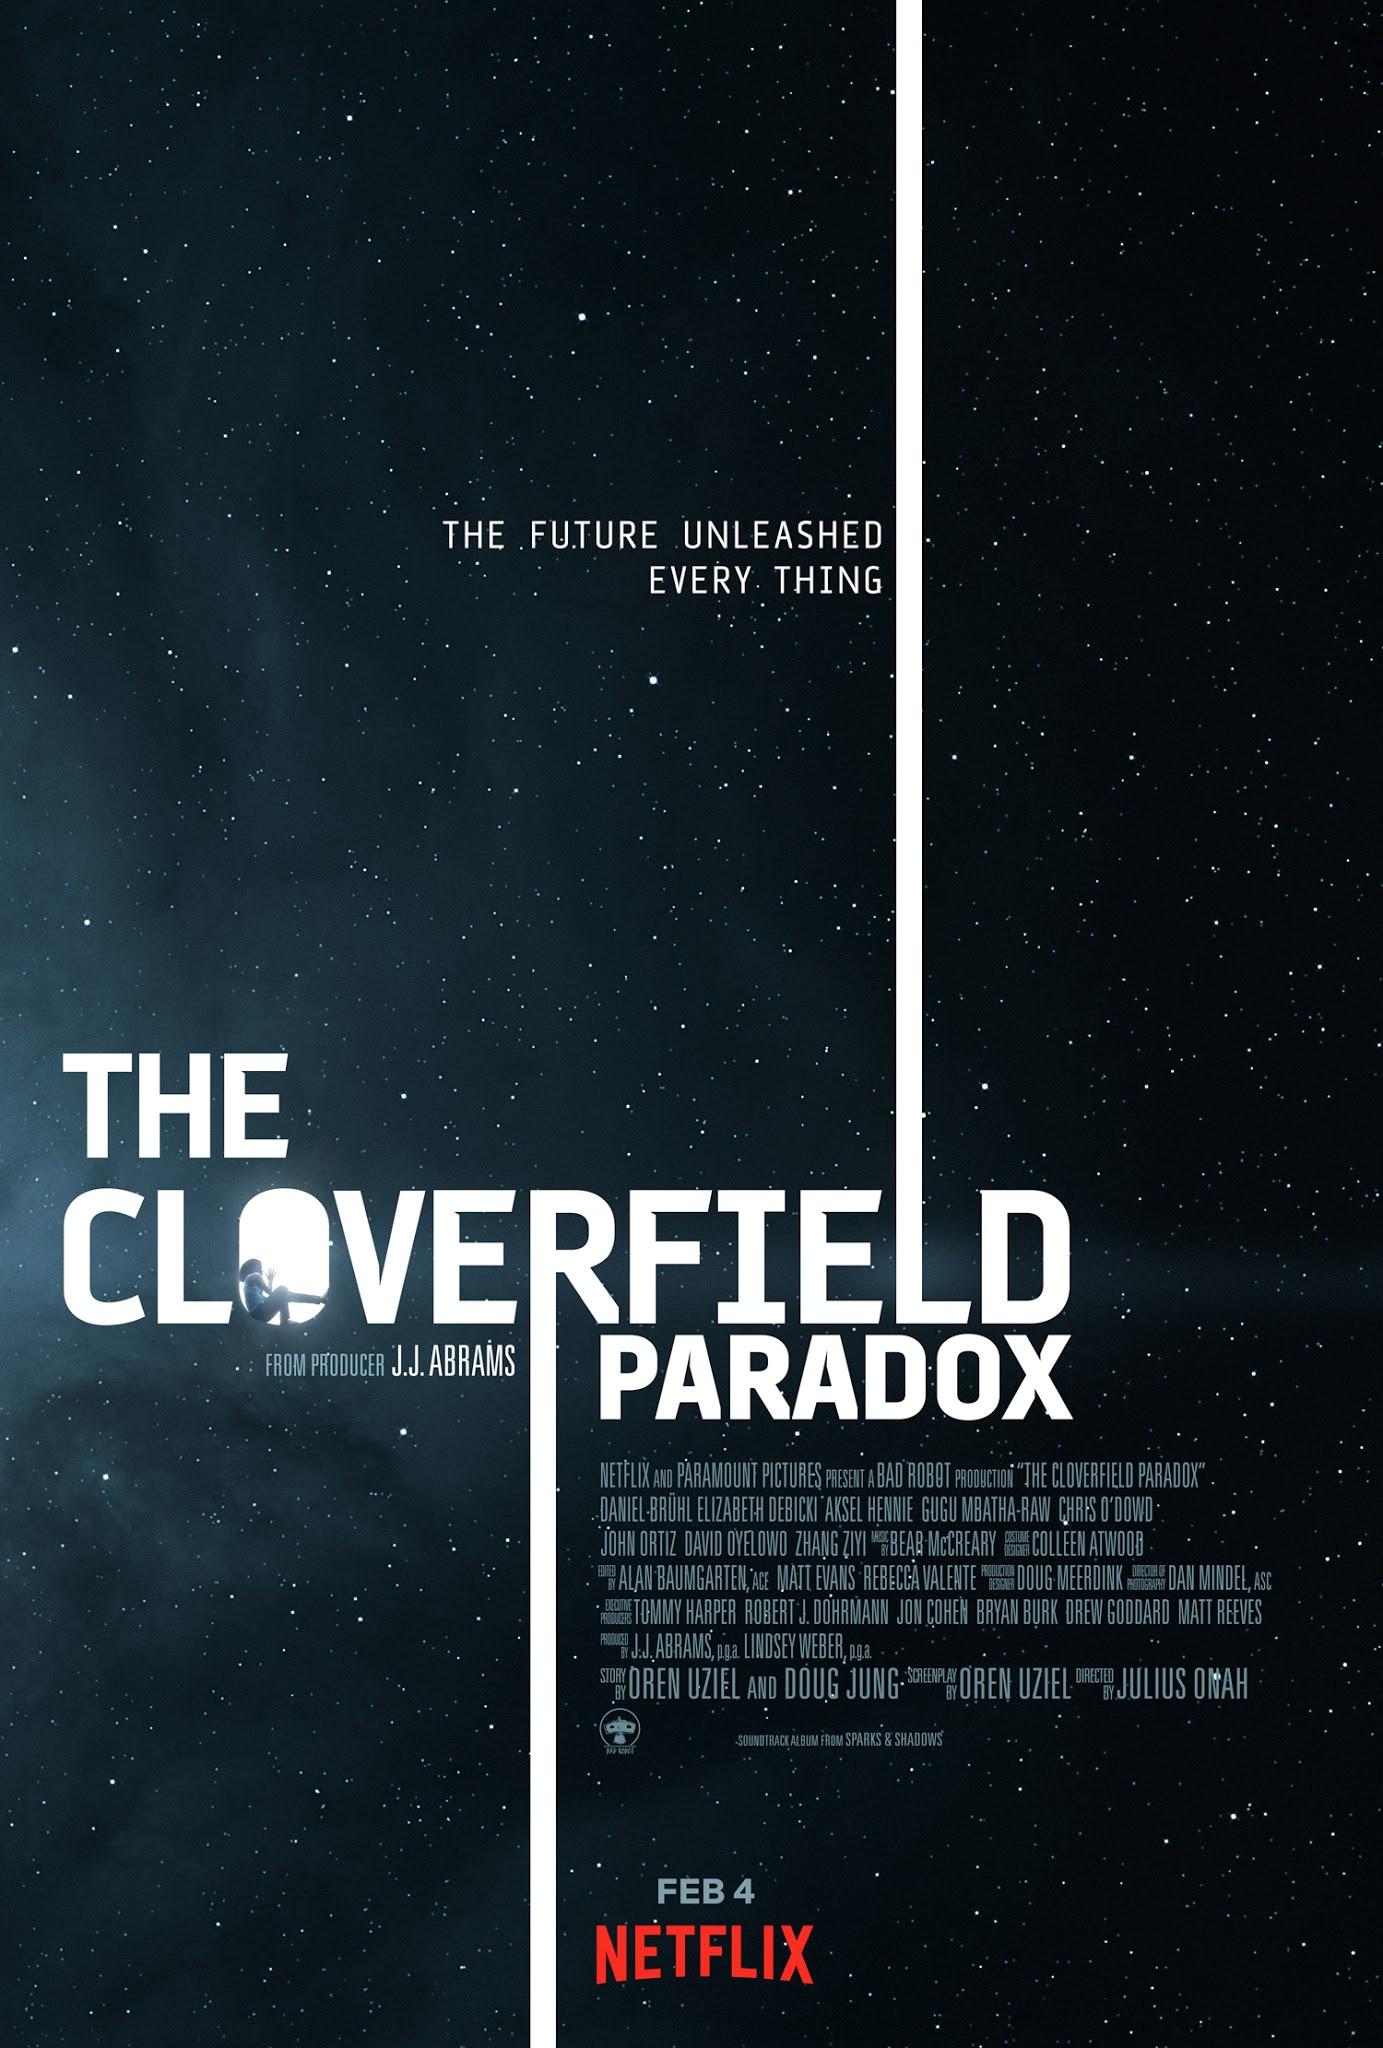 paradoks cloverfield recenzja filmu netflix j.j. abrams